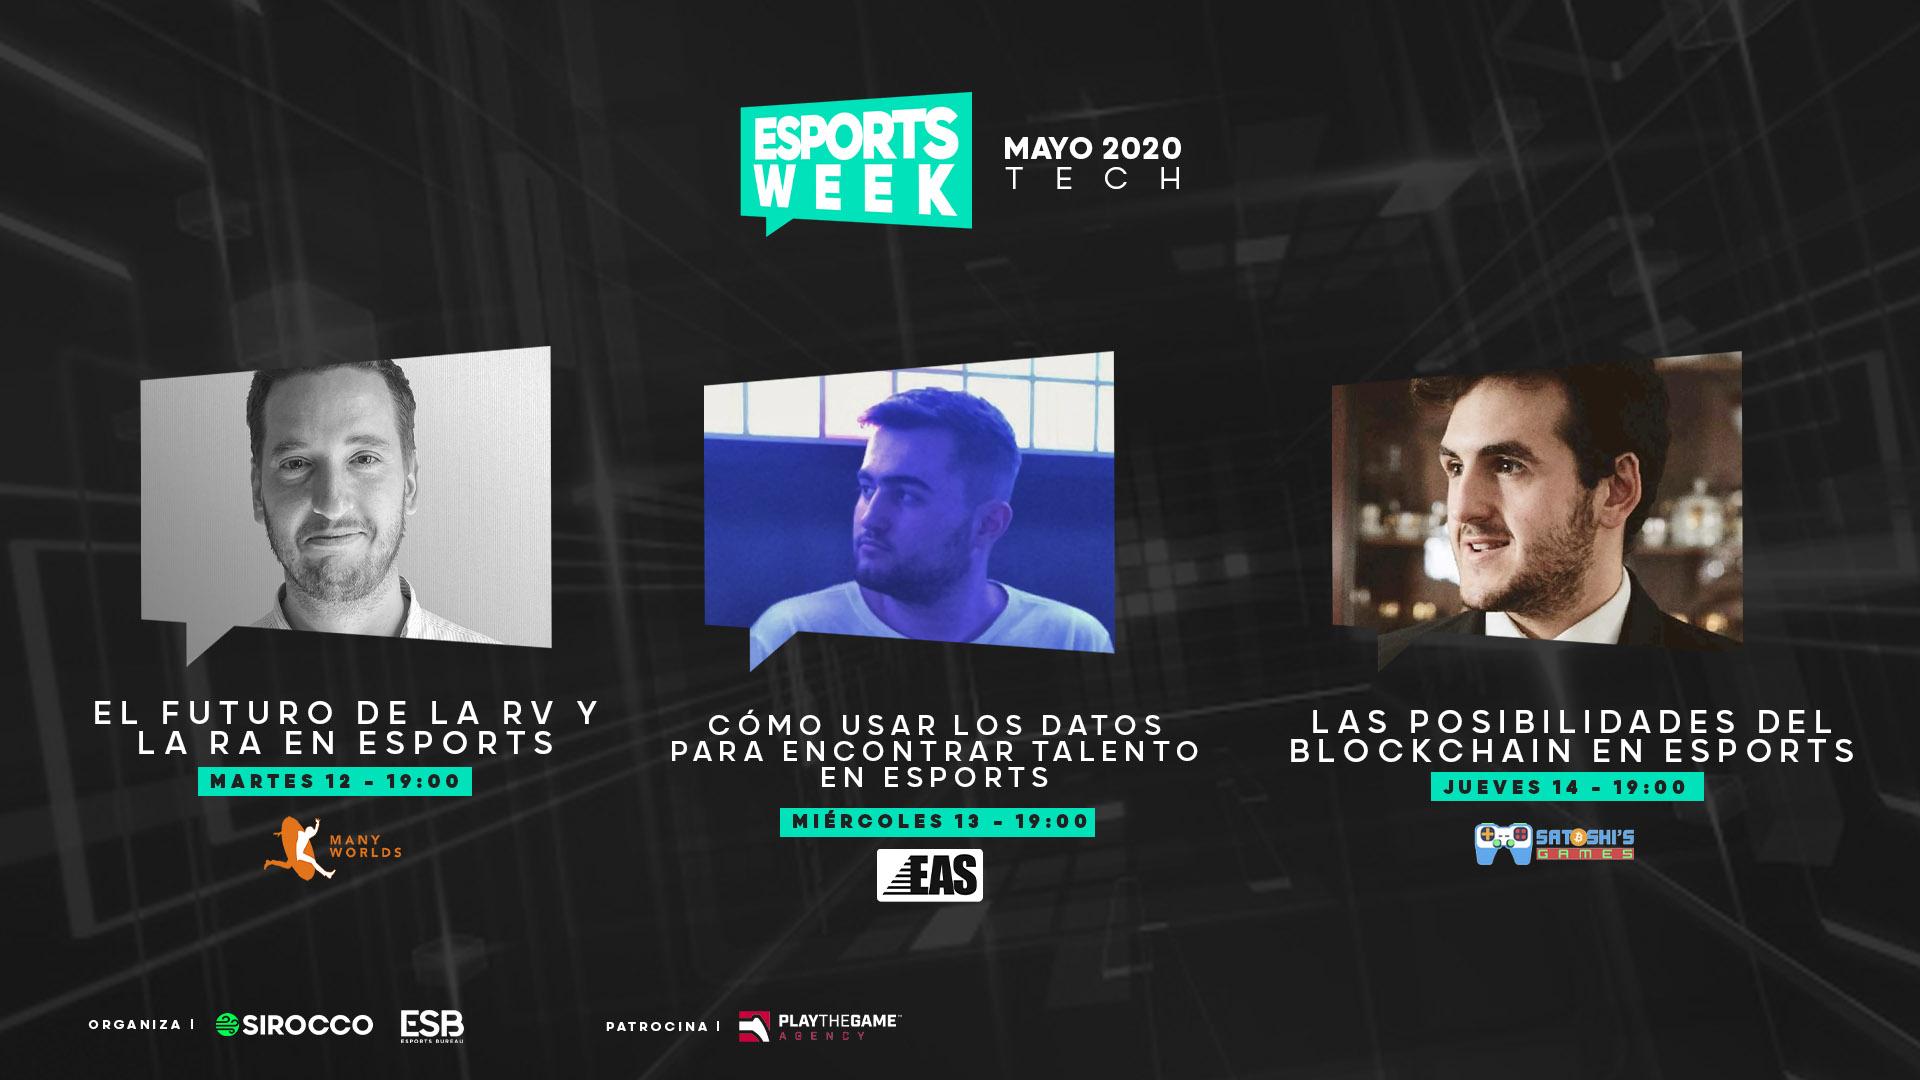 Esports Week